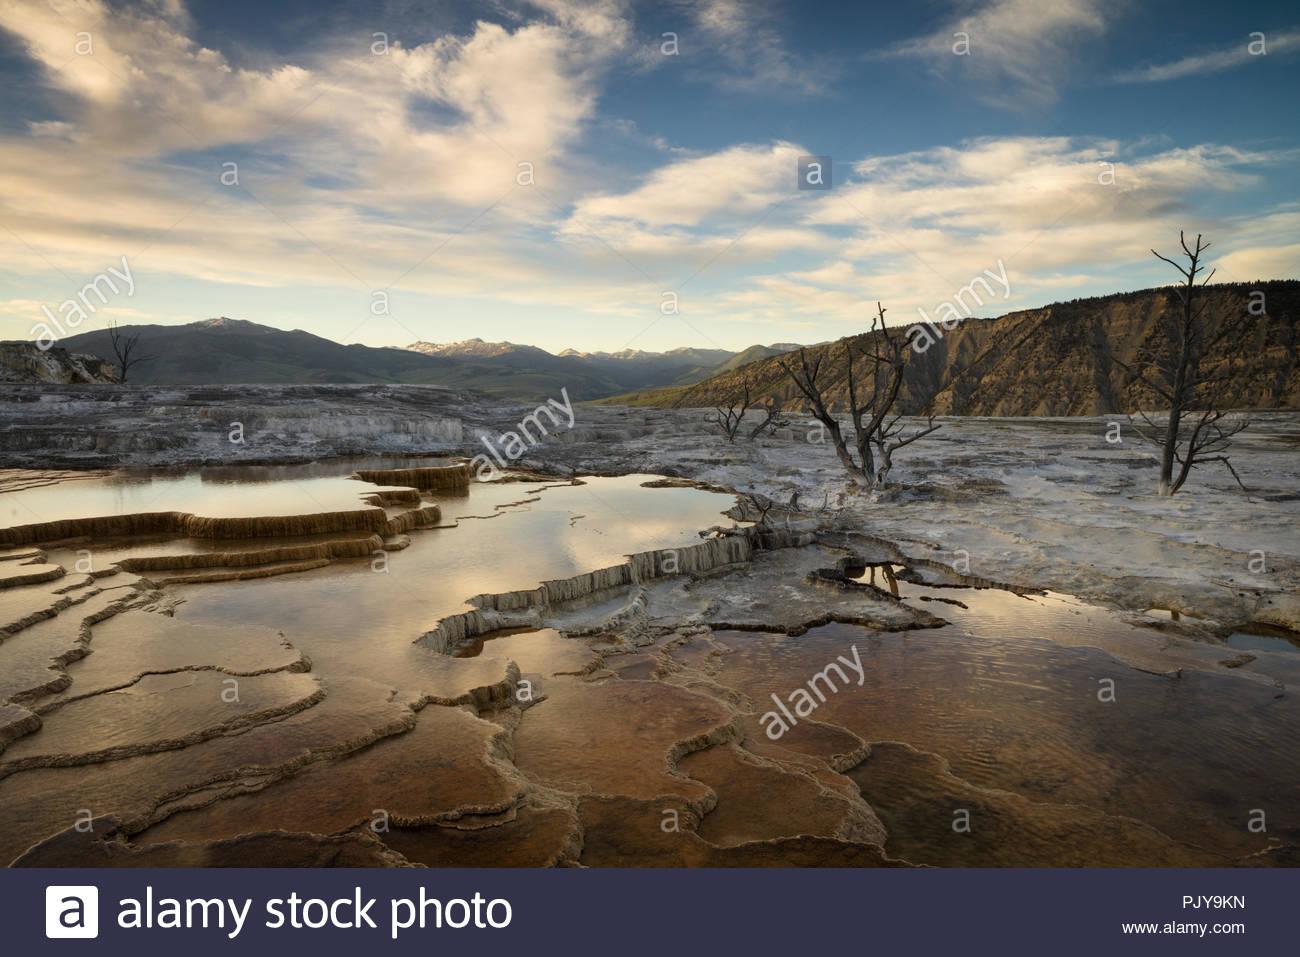 Mammoth Hot Springs, Yellowstone National Park, Wyoming Stockbild